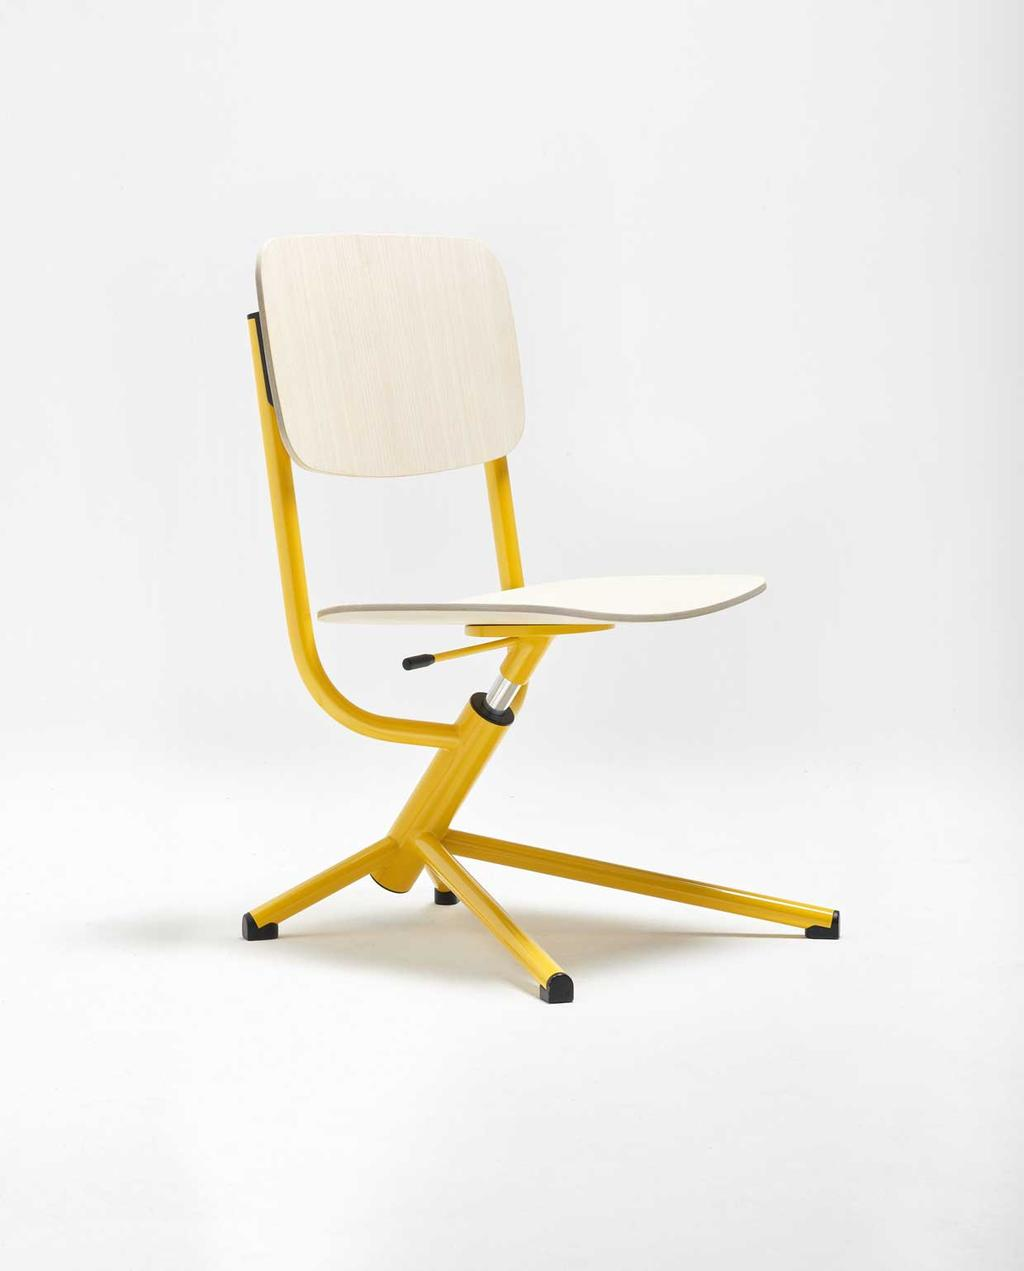 vtwonen | studentdesign | design speelgoed | Alexander schul | verstelbare stoel